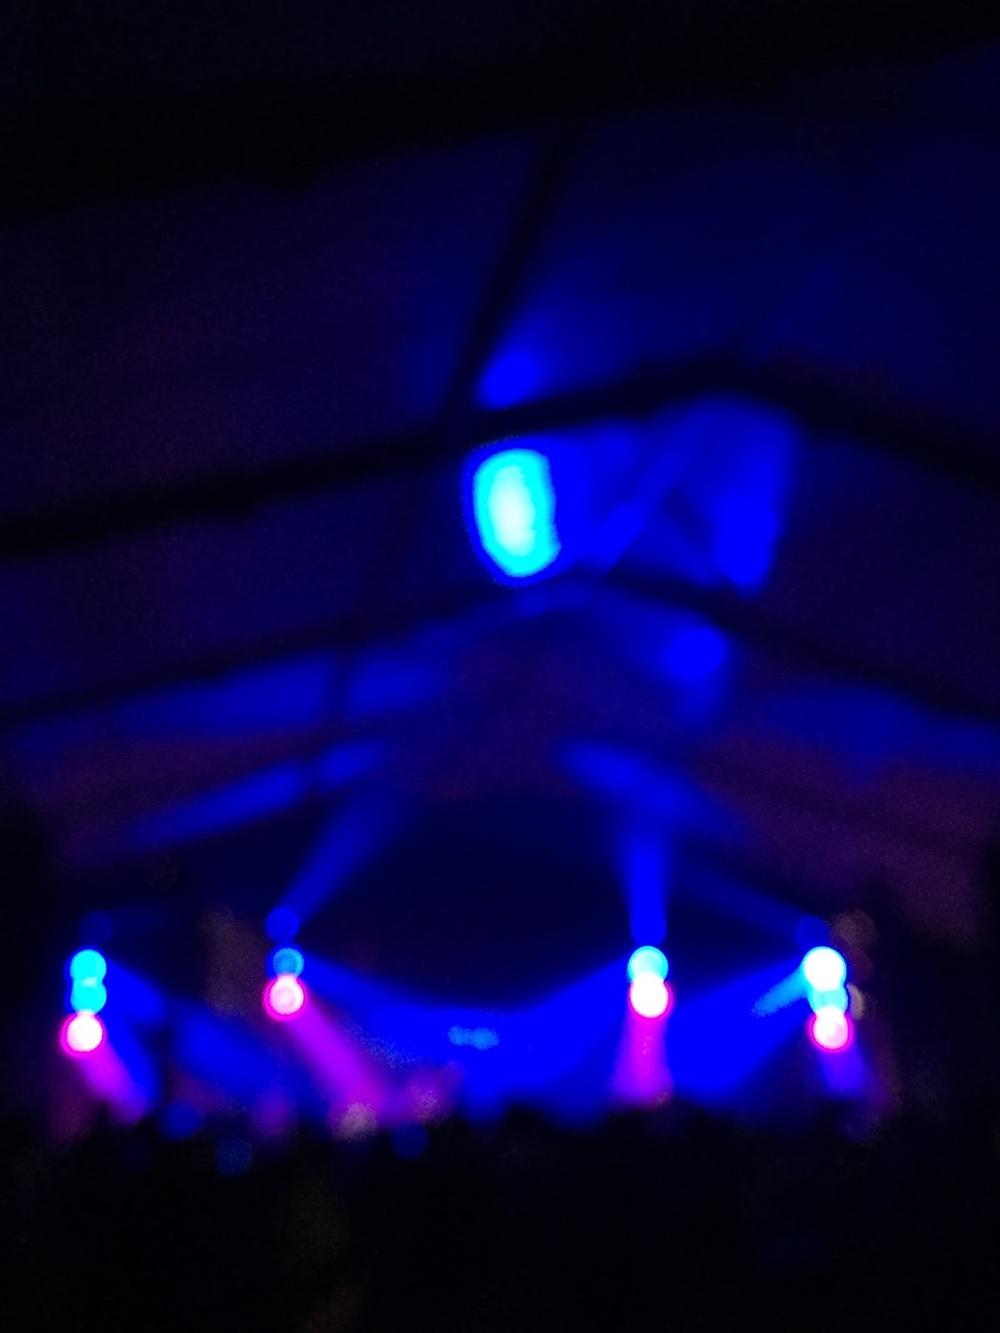 mybelonging-firefly-music-festival-2015-3.JPG